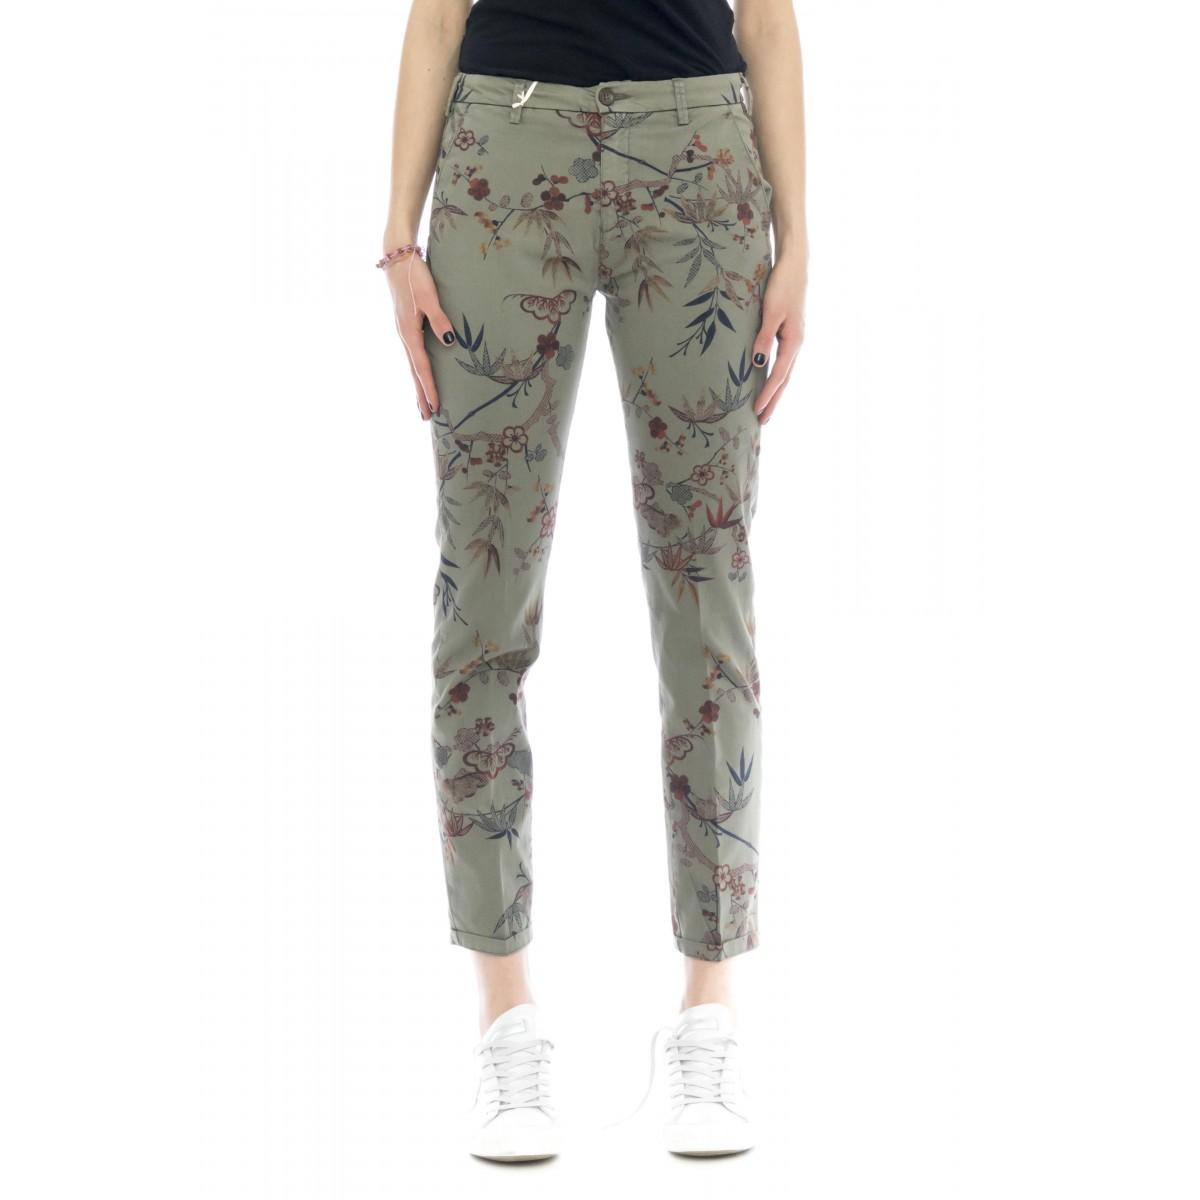 Pantalone donna - Briana 4285 skinny stampa